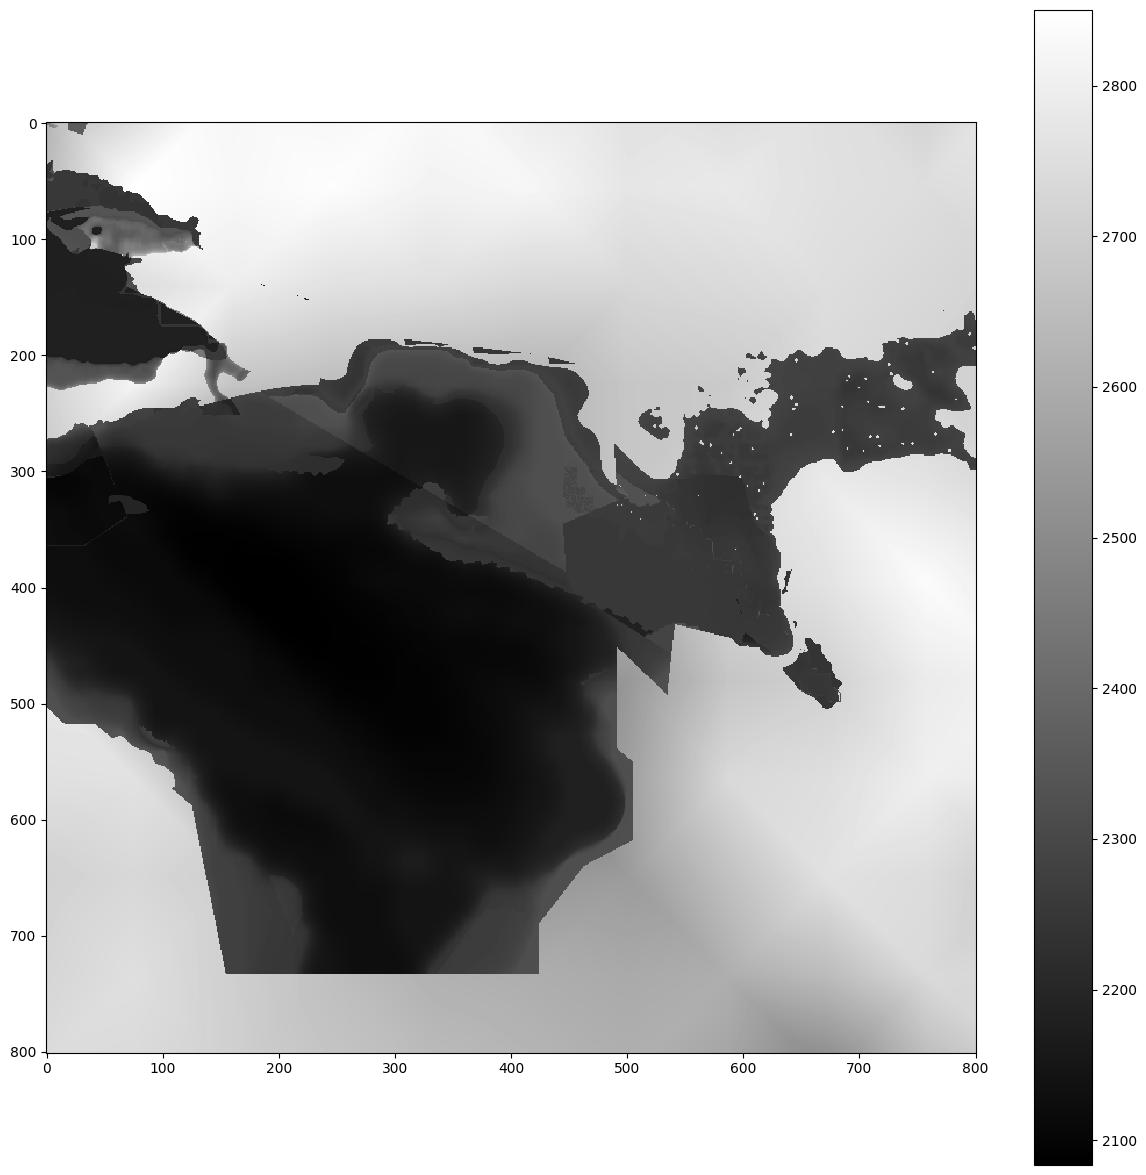 bench/seismic/wp/la_habra/meshes/velocity_model/plots/rho_250.png